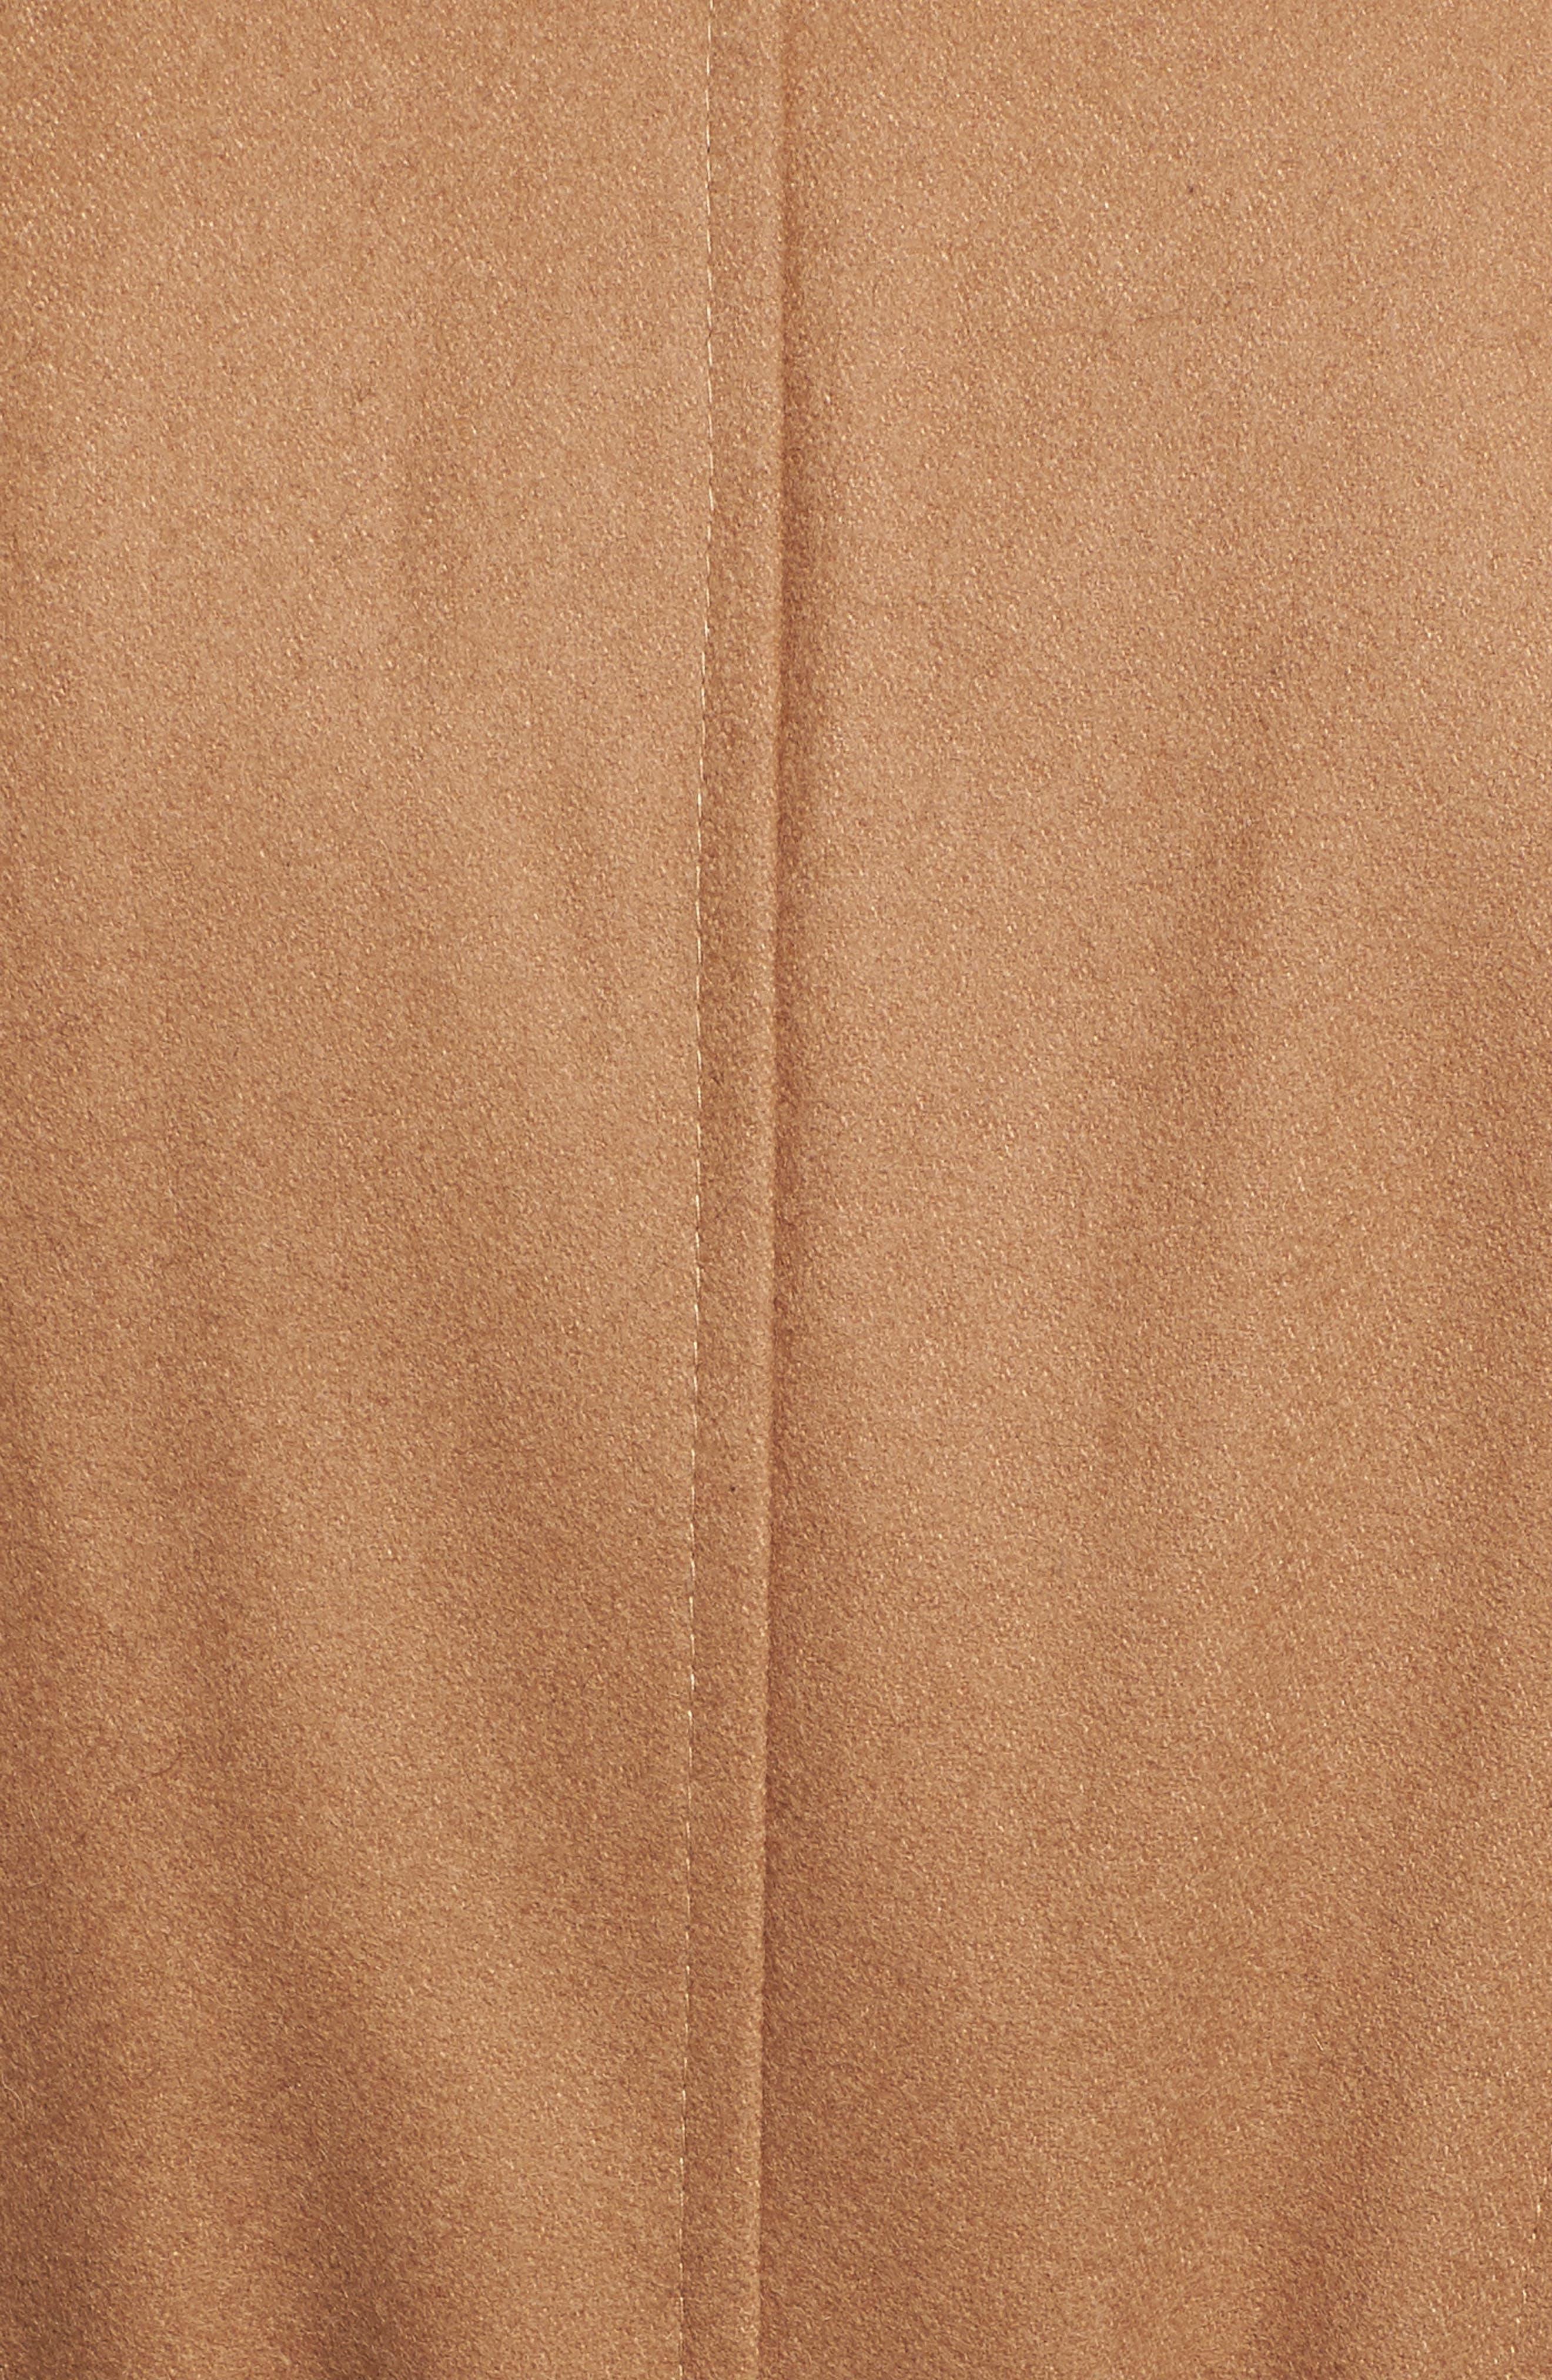 Faux Leather & Faux Fur Trim Belted Wool Blend Coat,                             Alternate thumbnail 40, color,